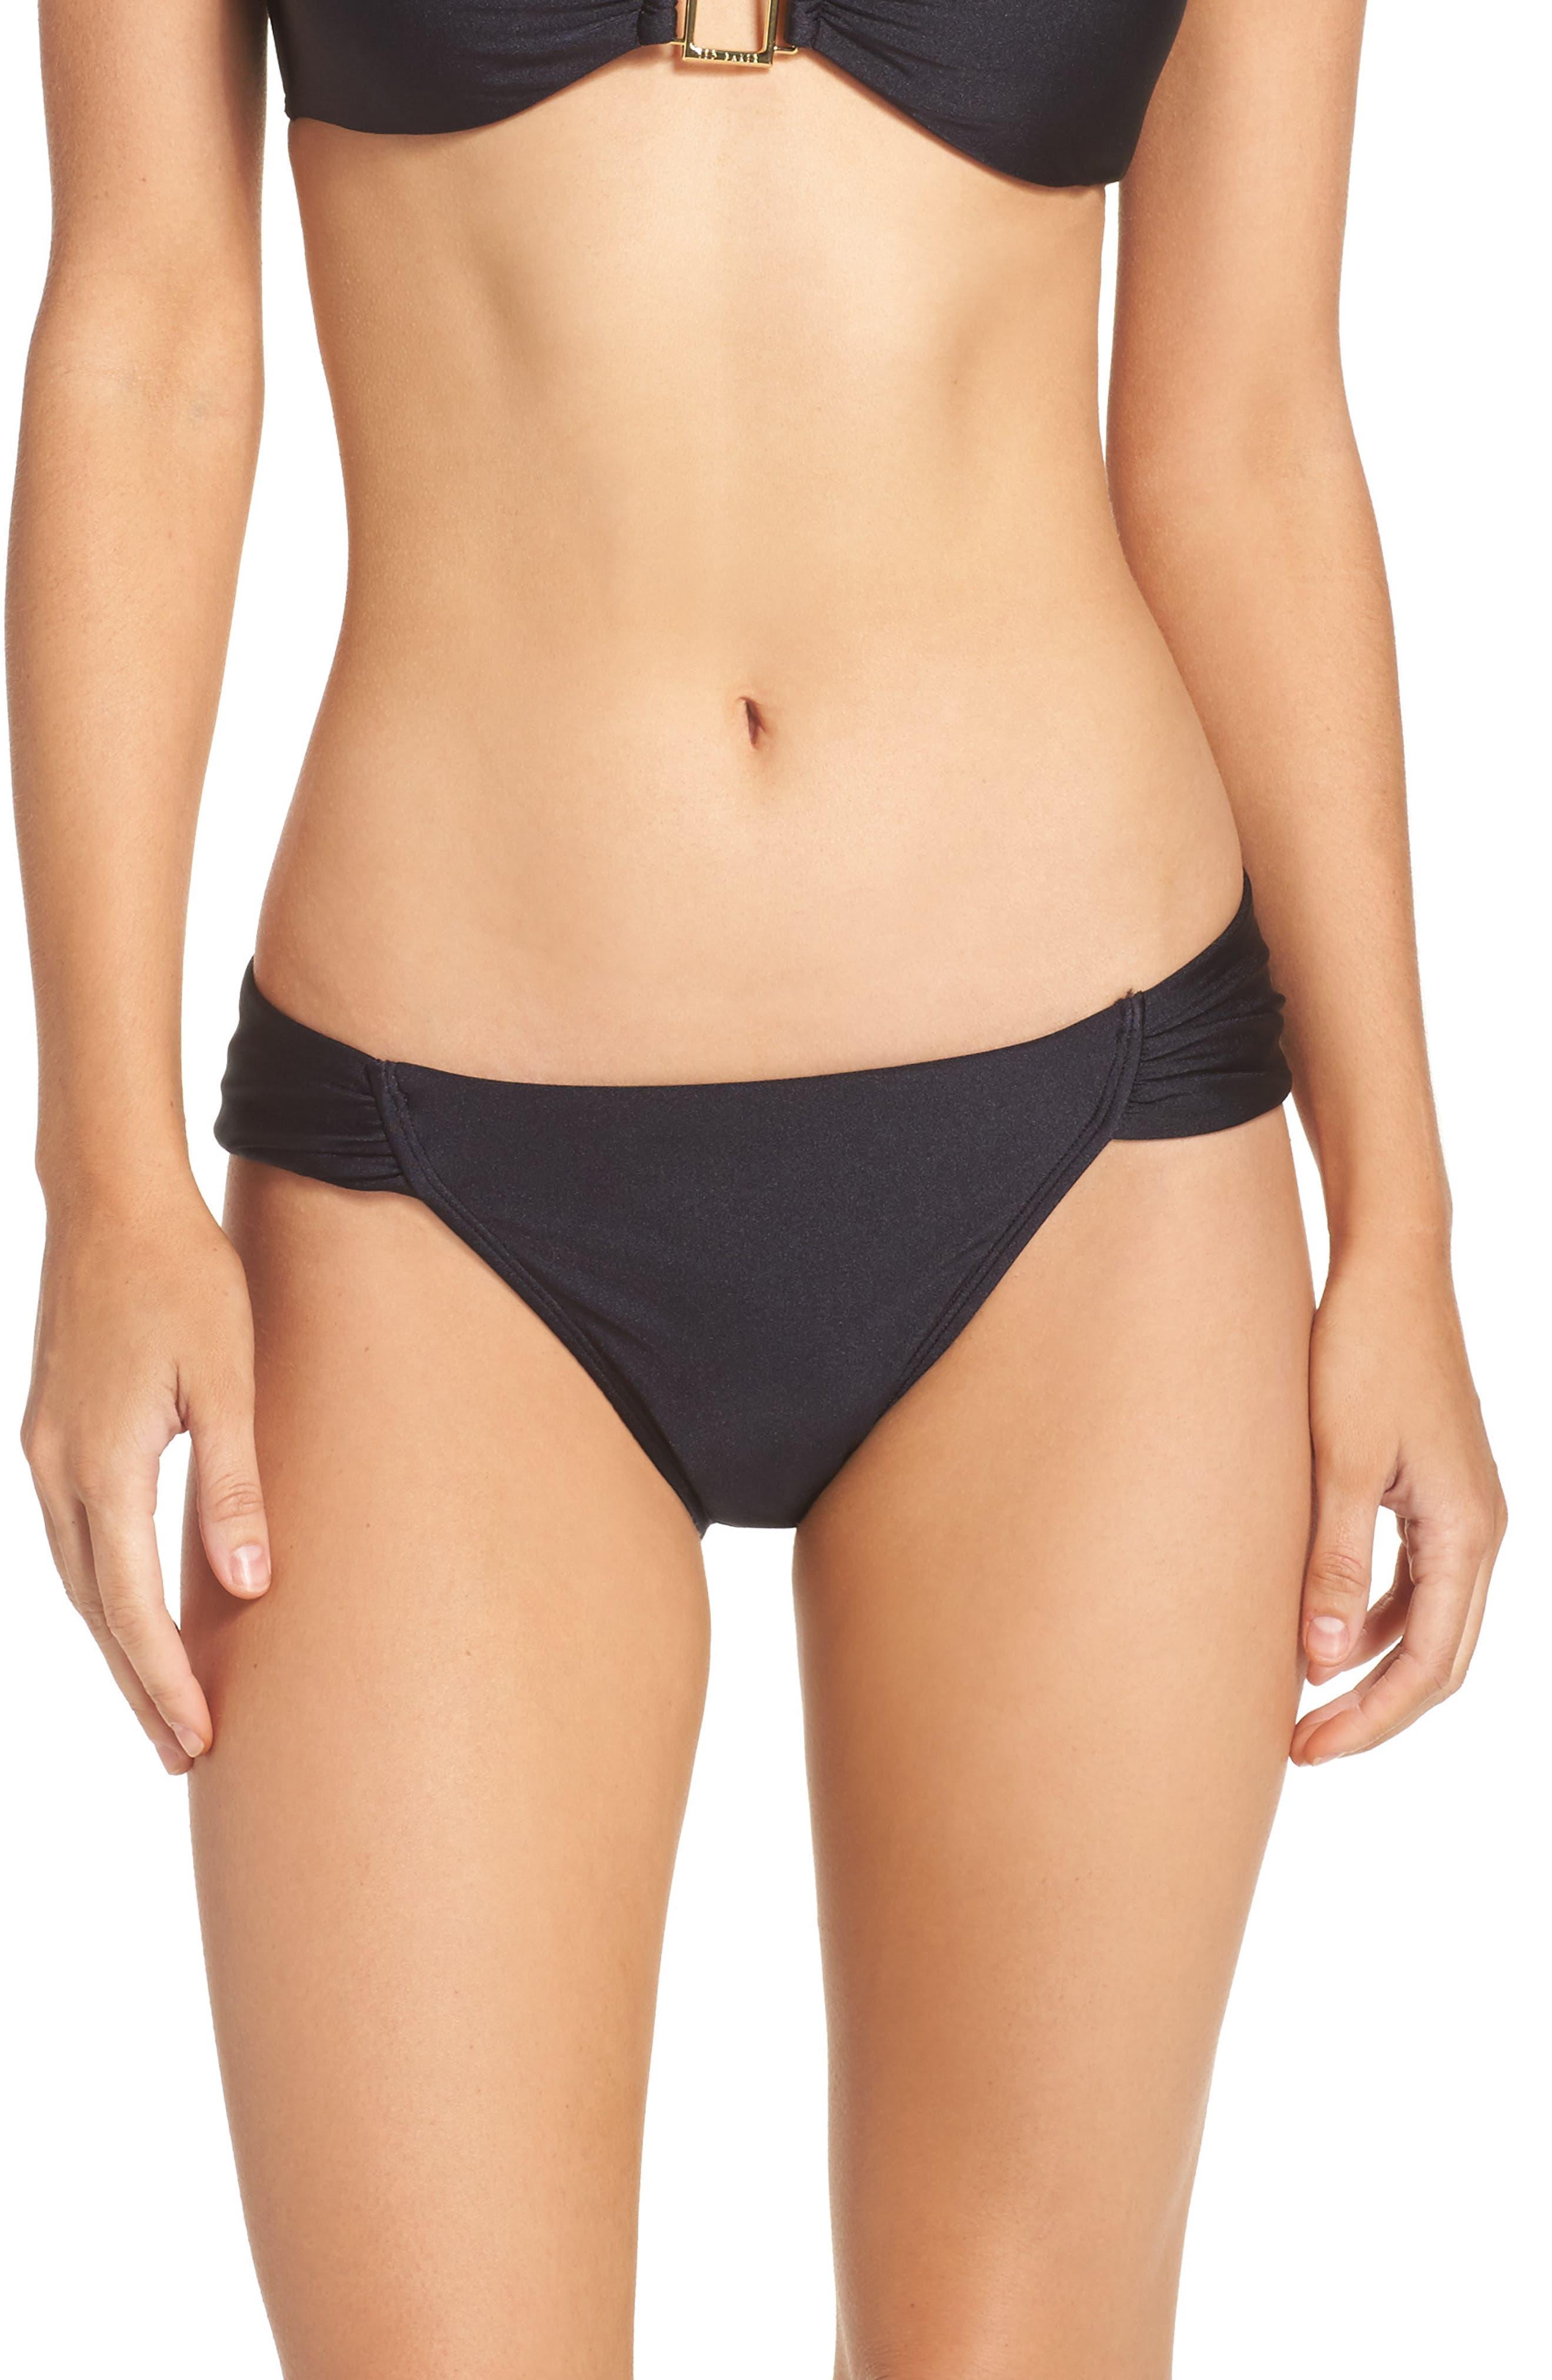 Annay Classic Bikini Bottoms,                             Main thumbnail 1, color,                             001